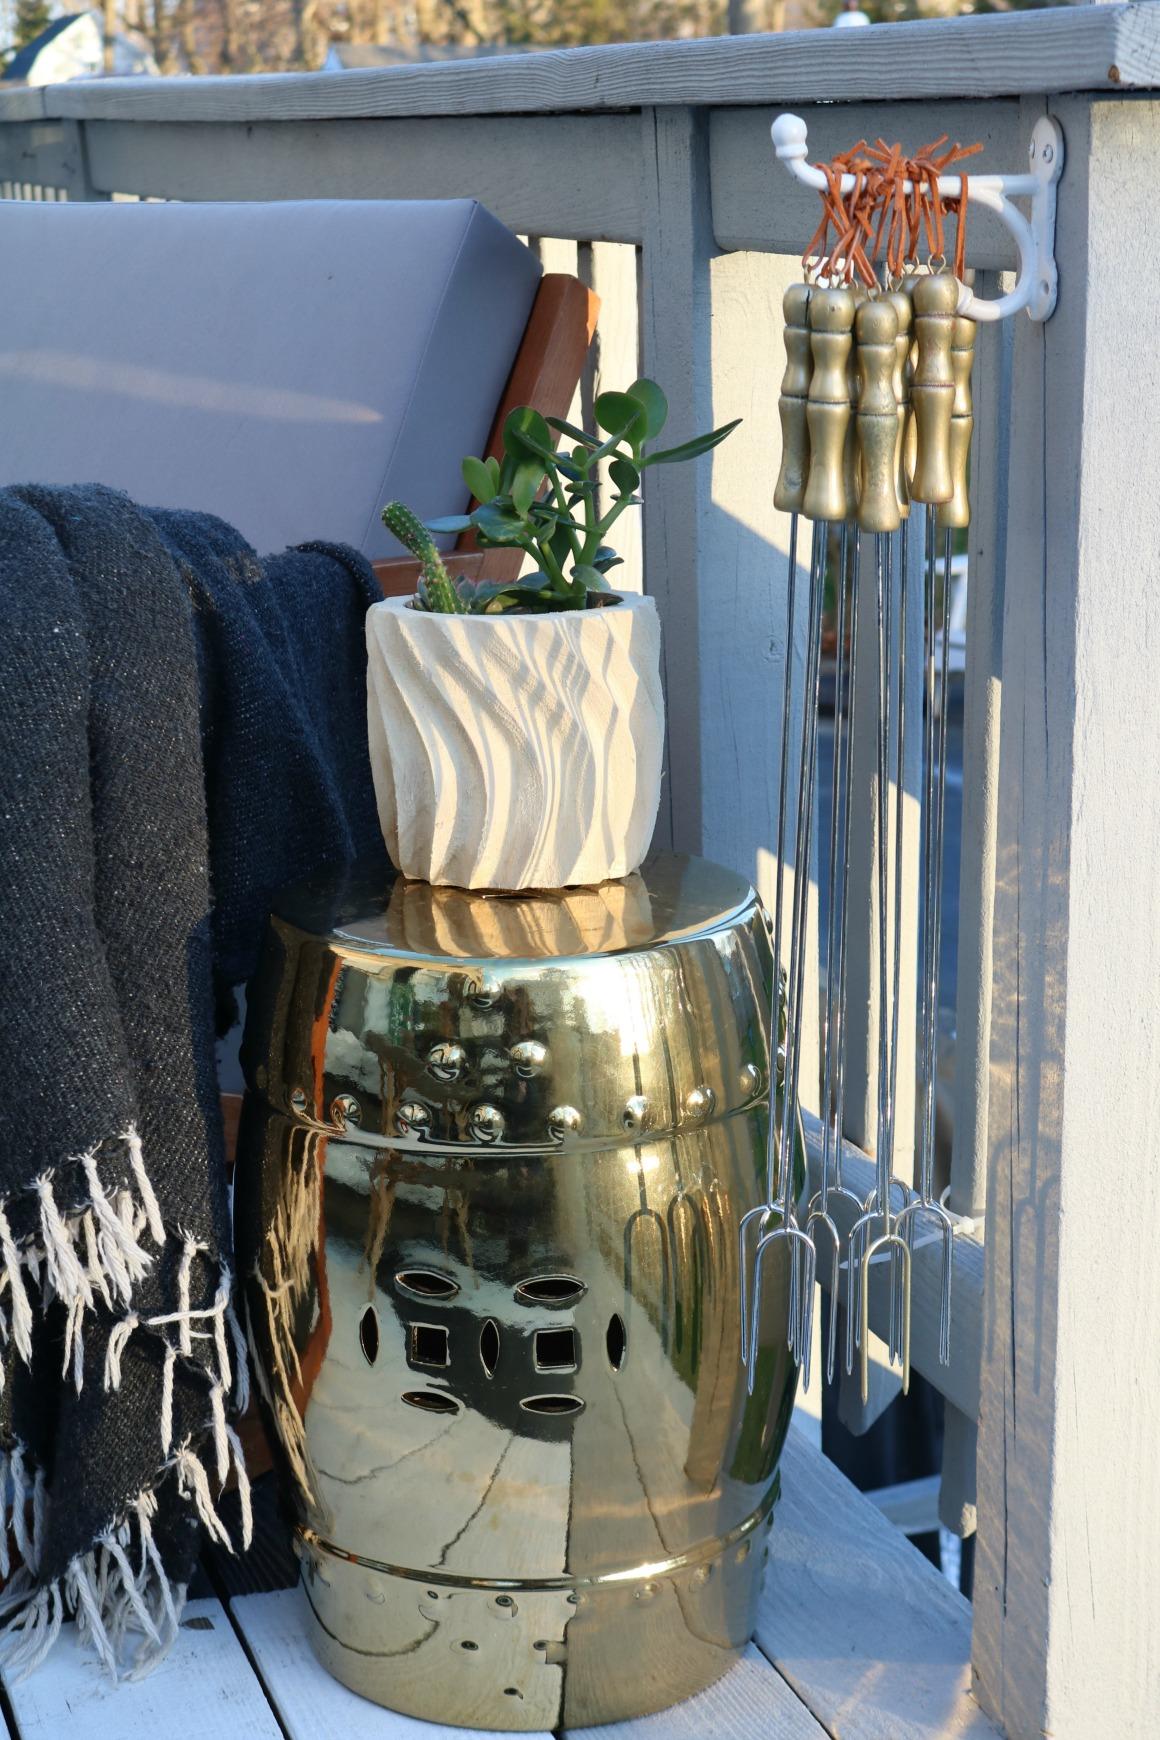 Smore' Stick- Storage Ideas for Backyard Fire pit